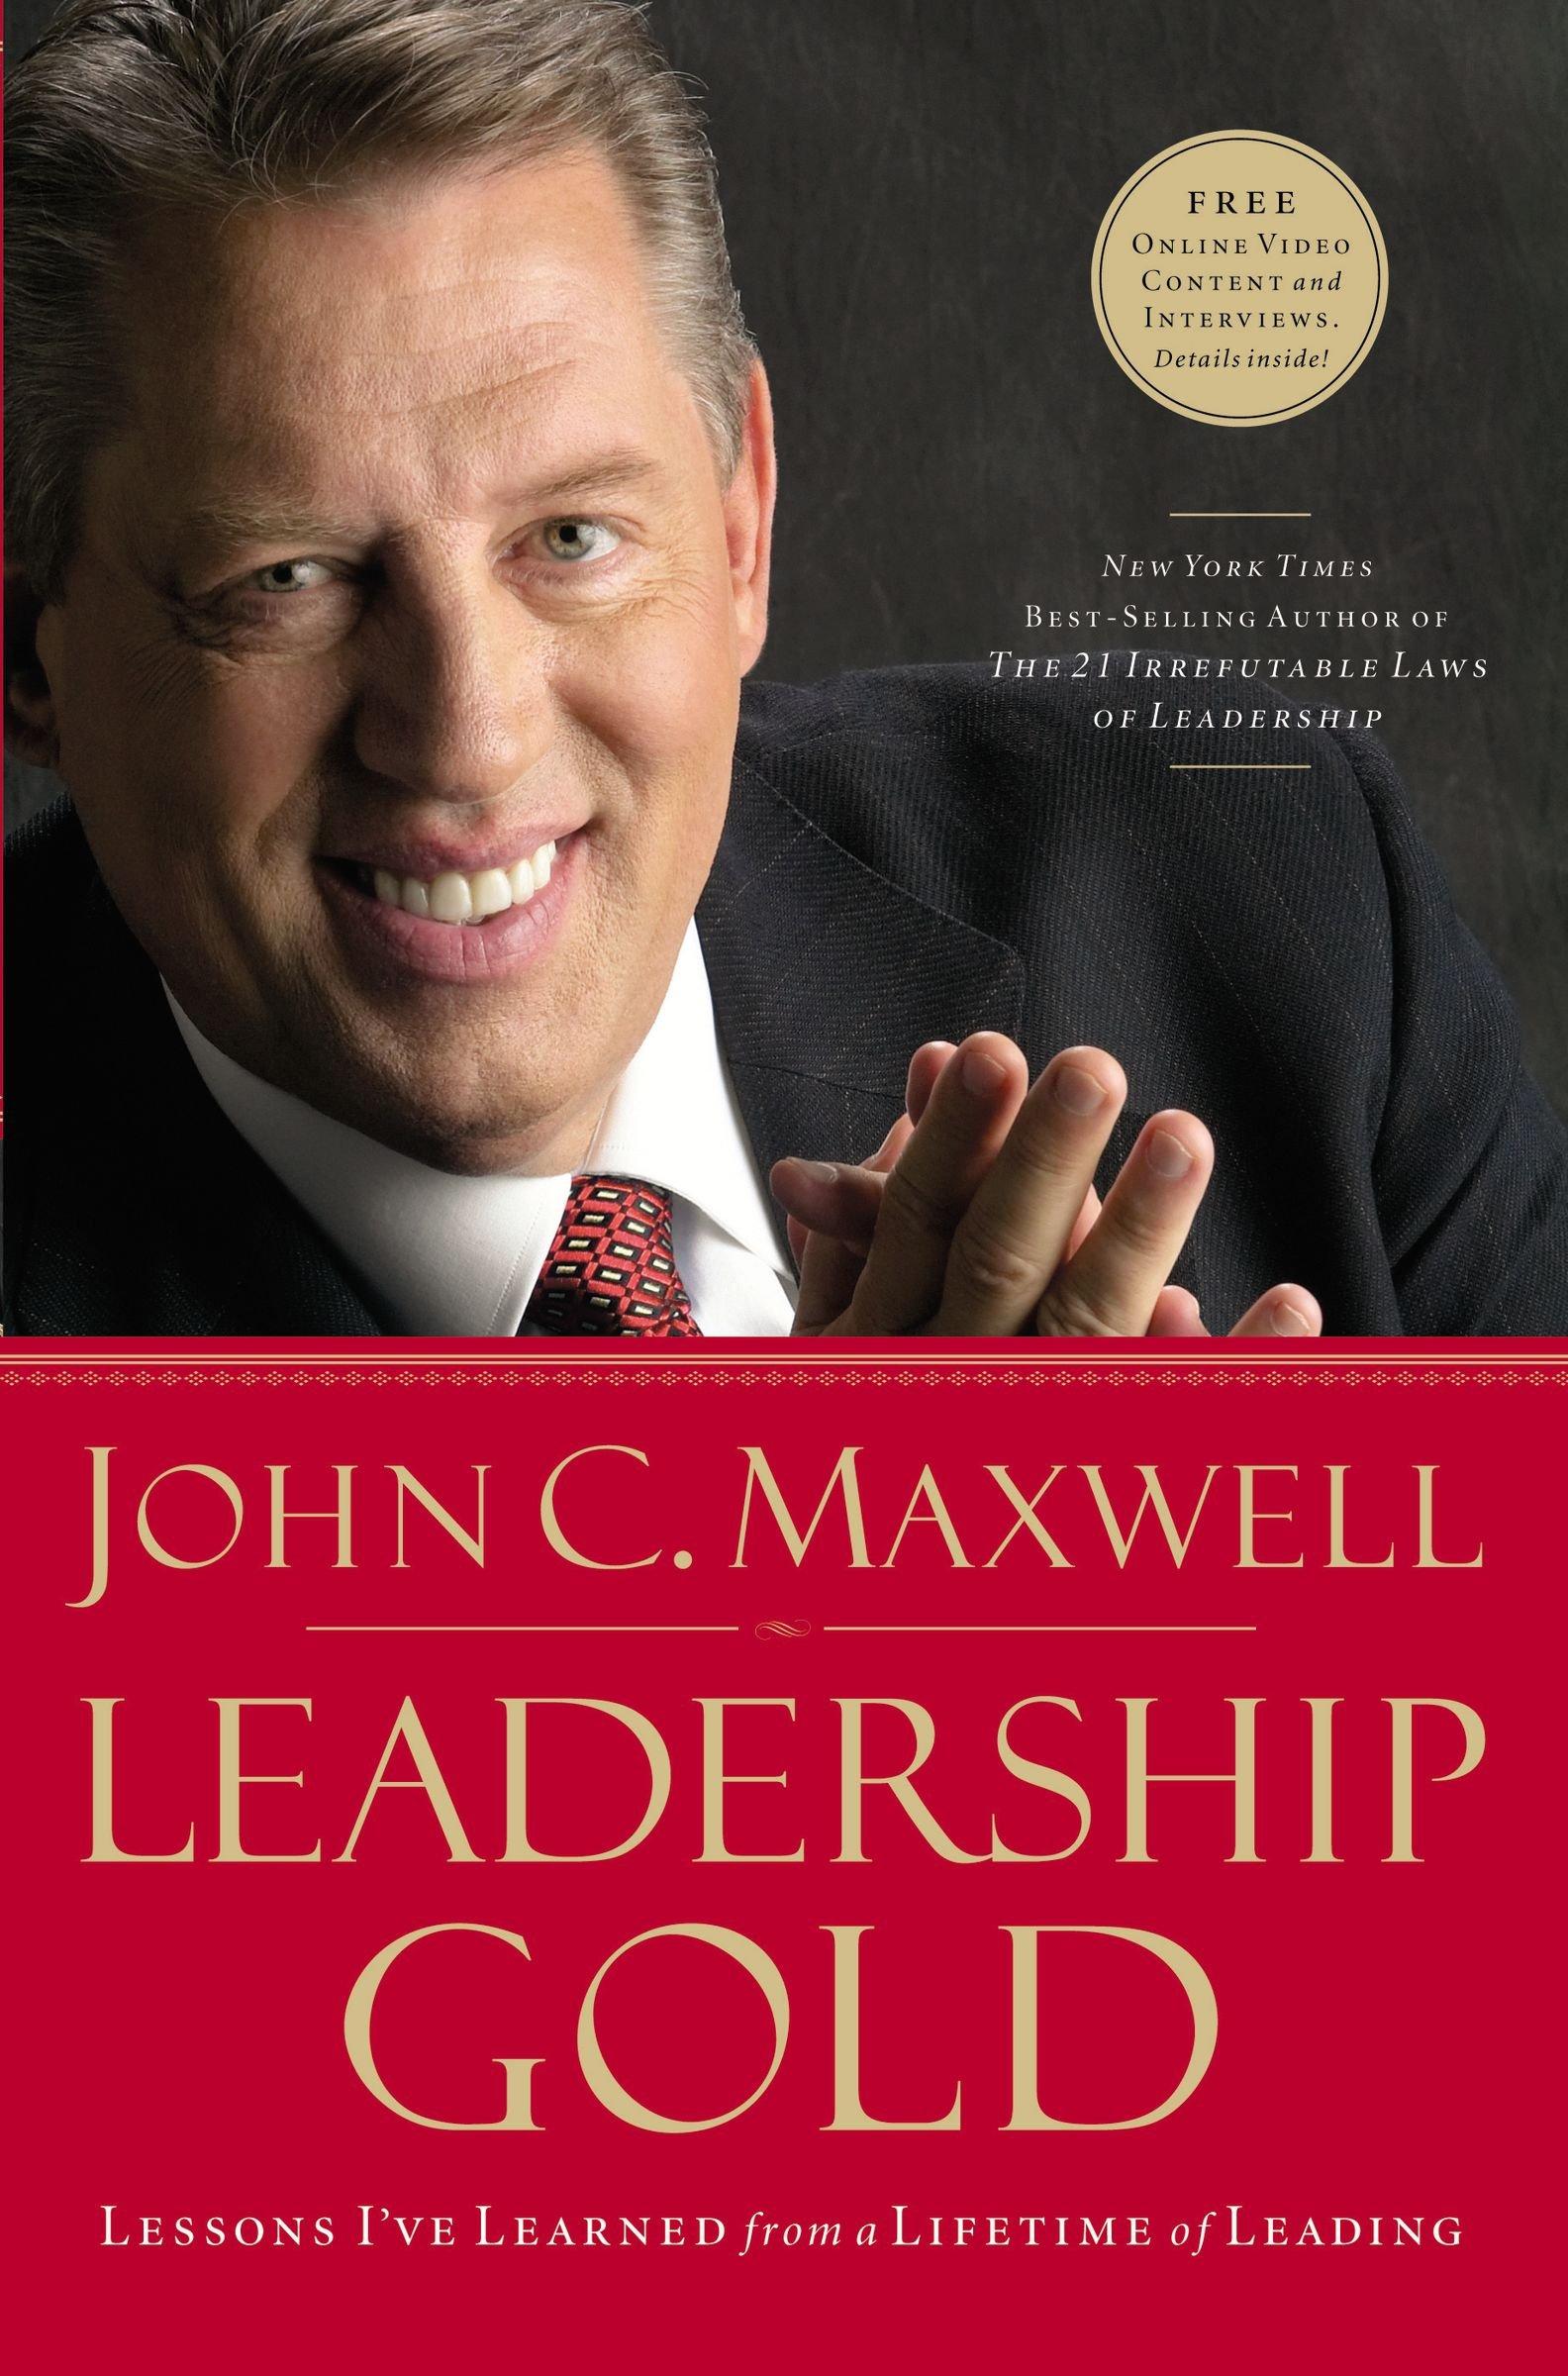 Leadership Gold Summary